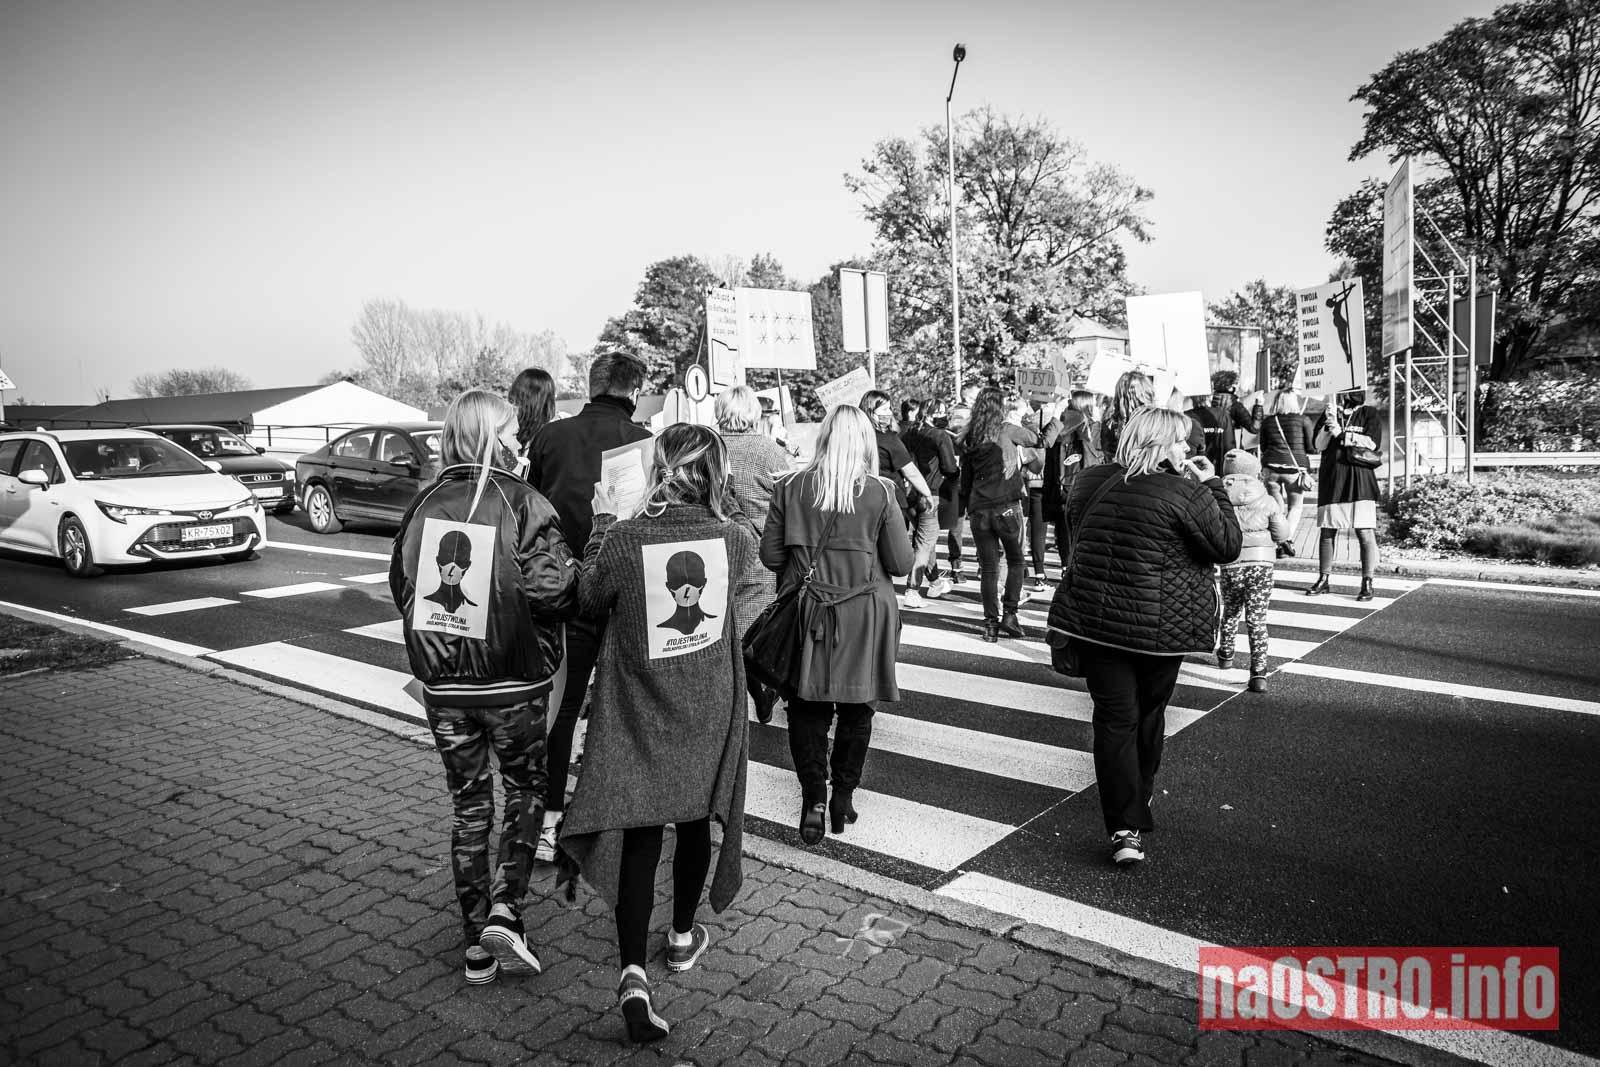 NaOSTROinfo Strajk Kobiet-17